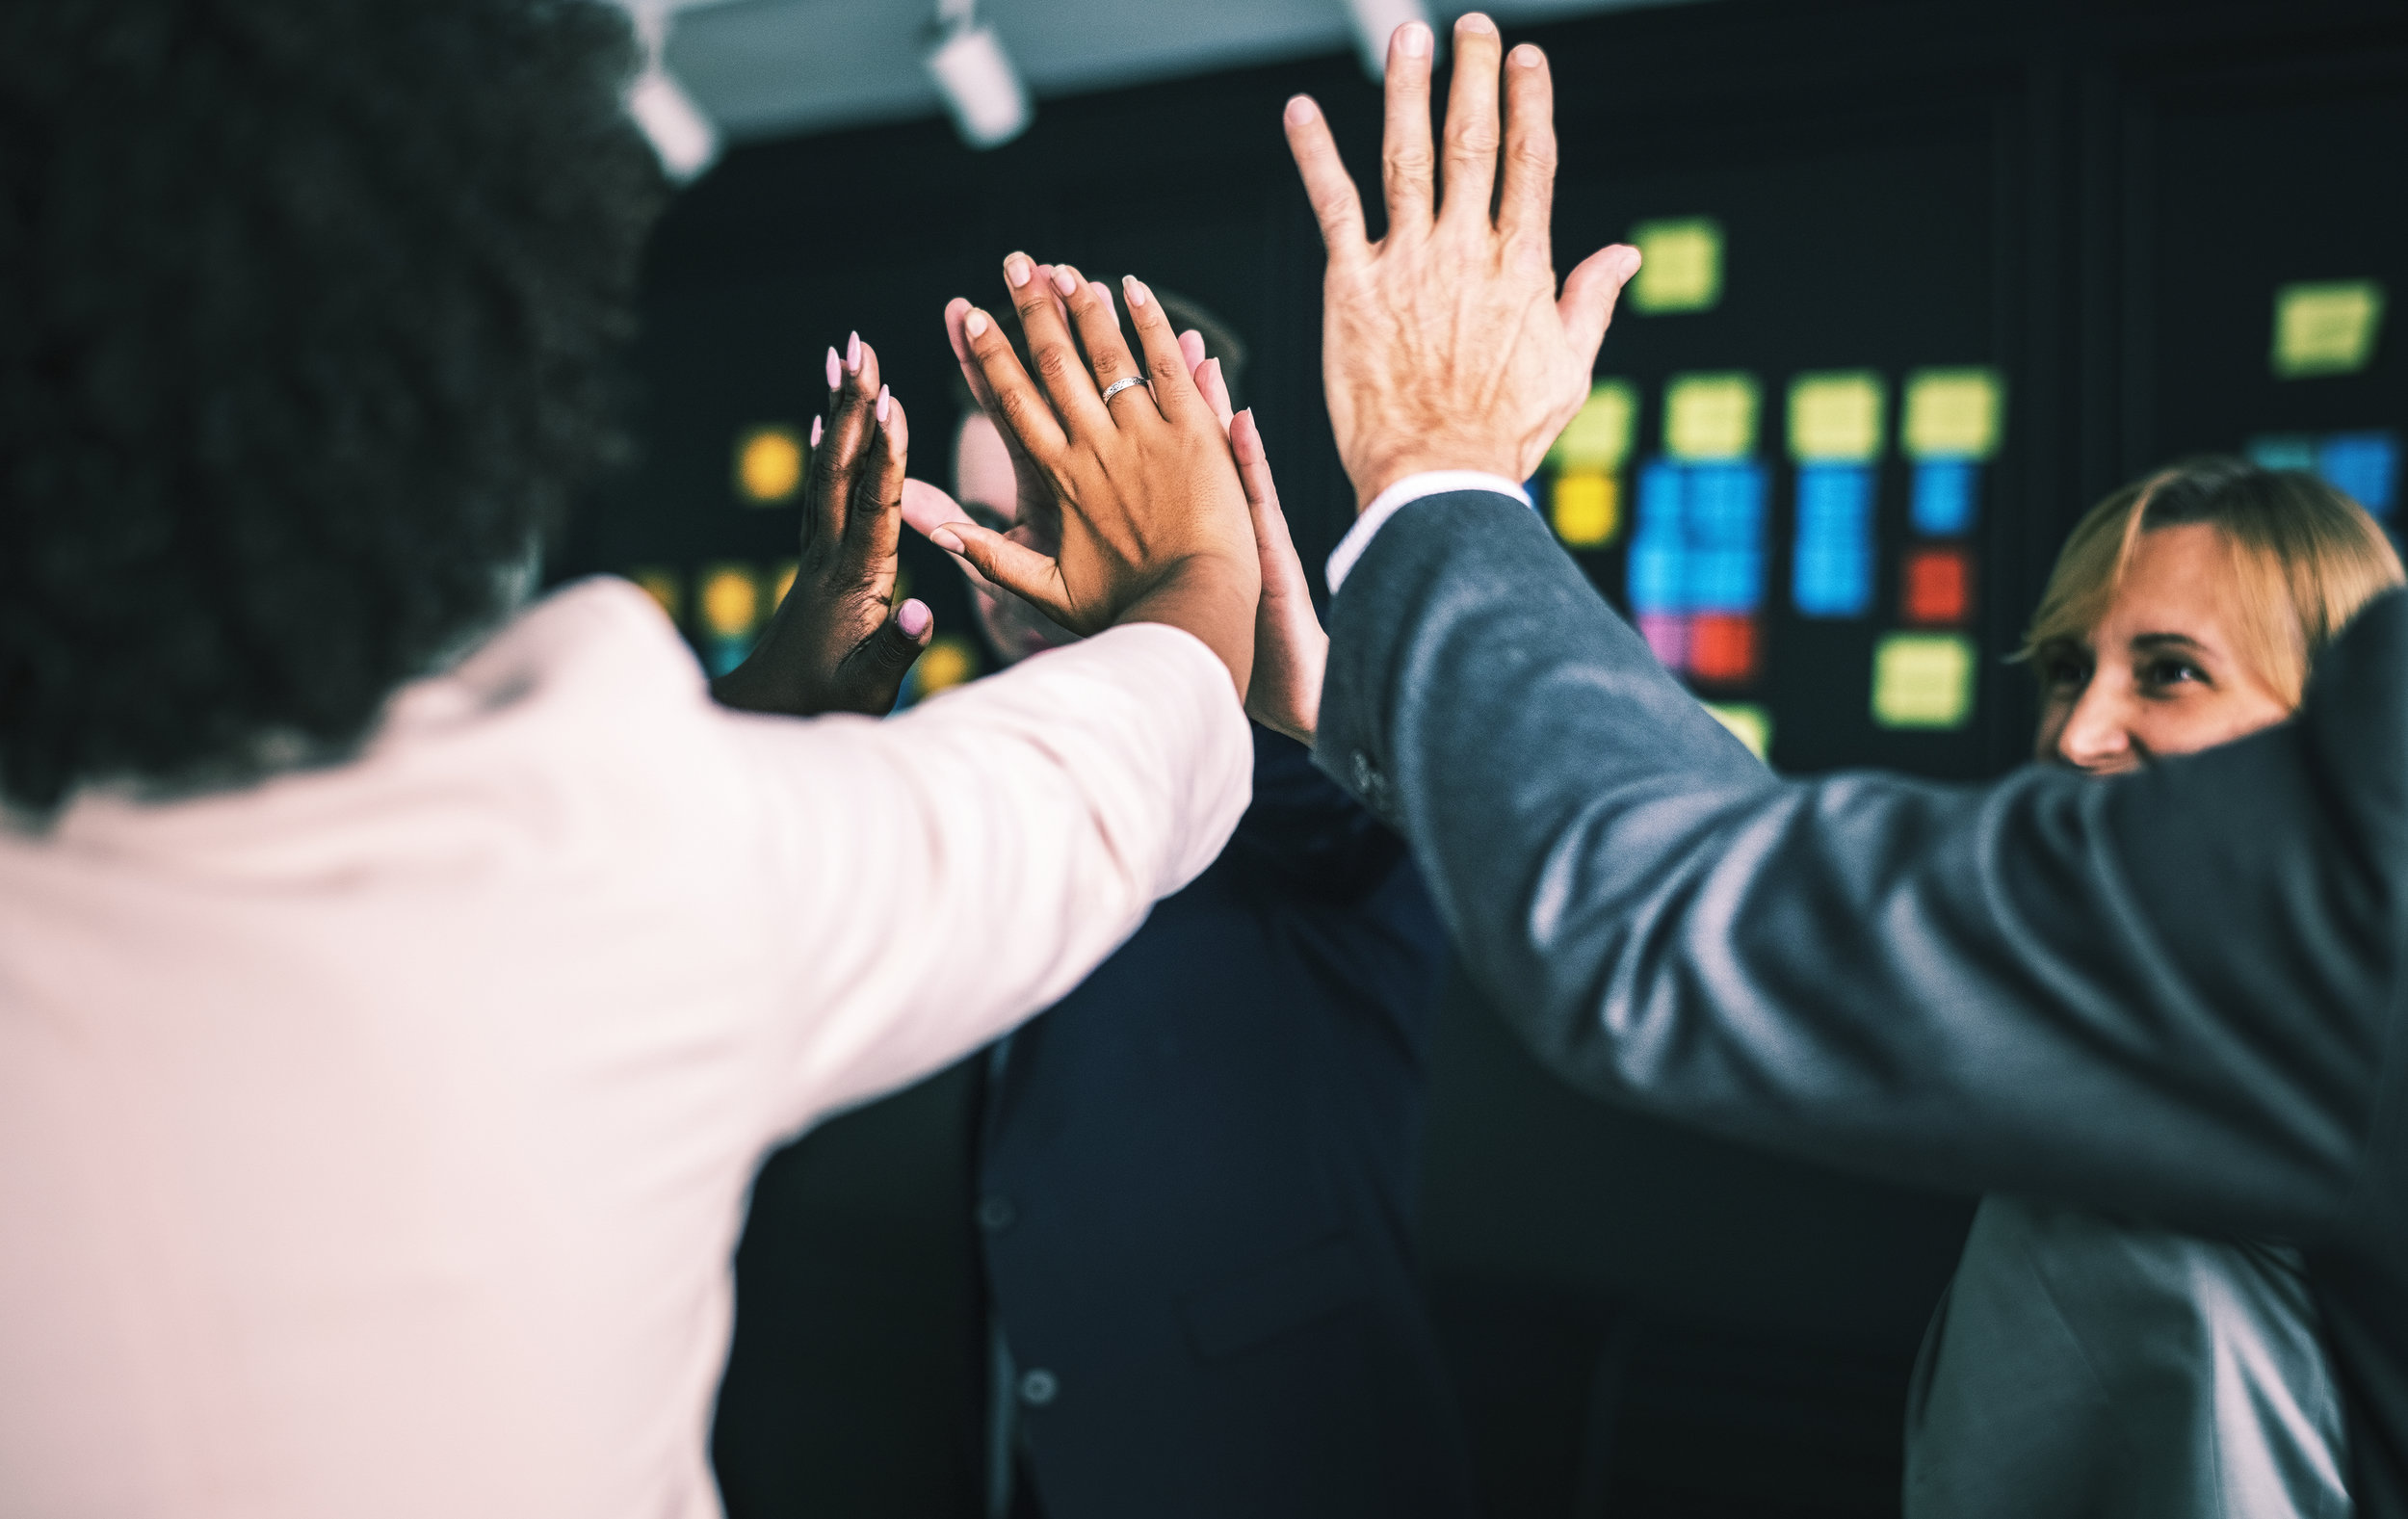 leadership-experience-teamwork-law-of-significance-minneapolis.jpg